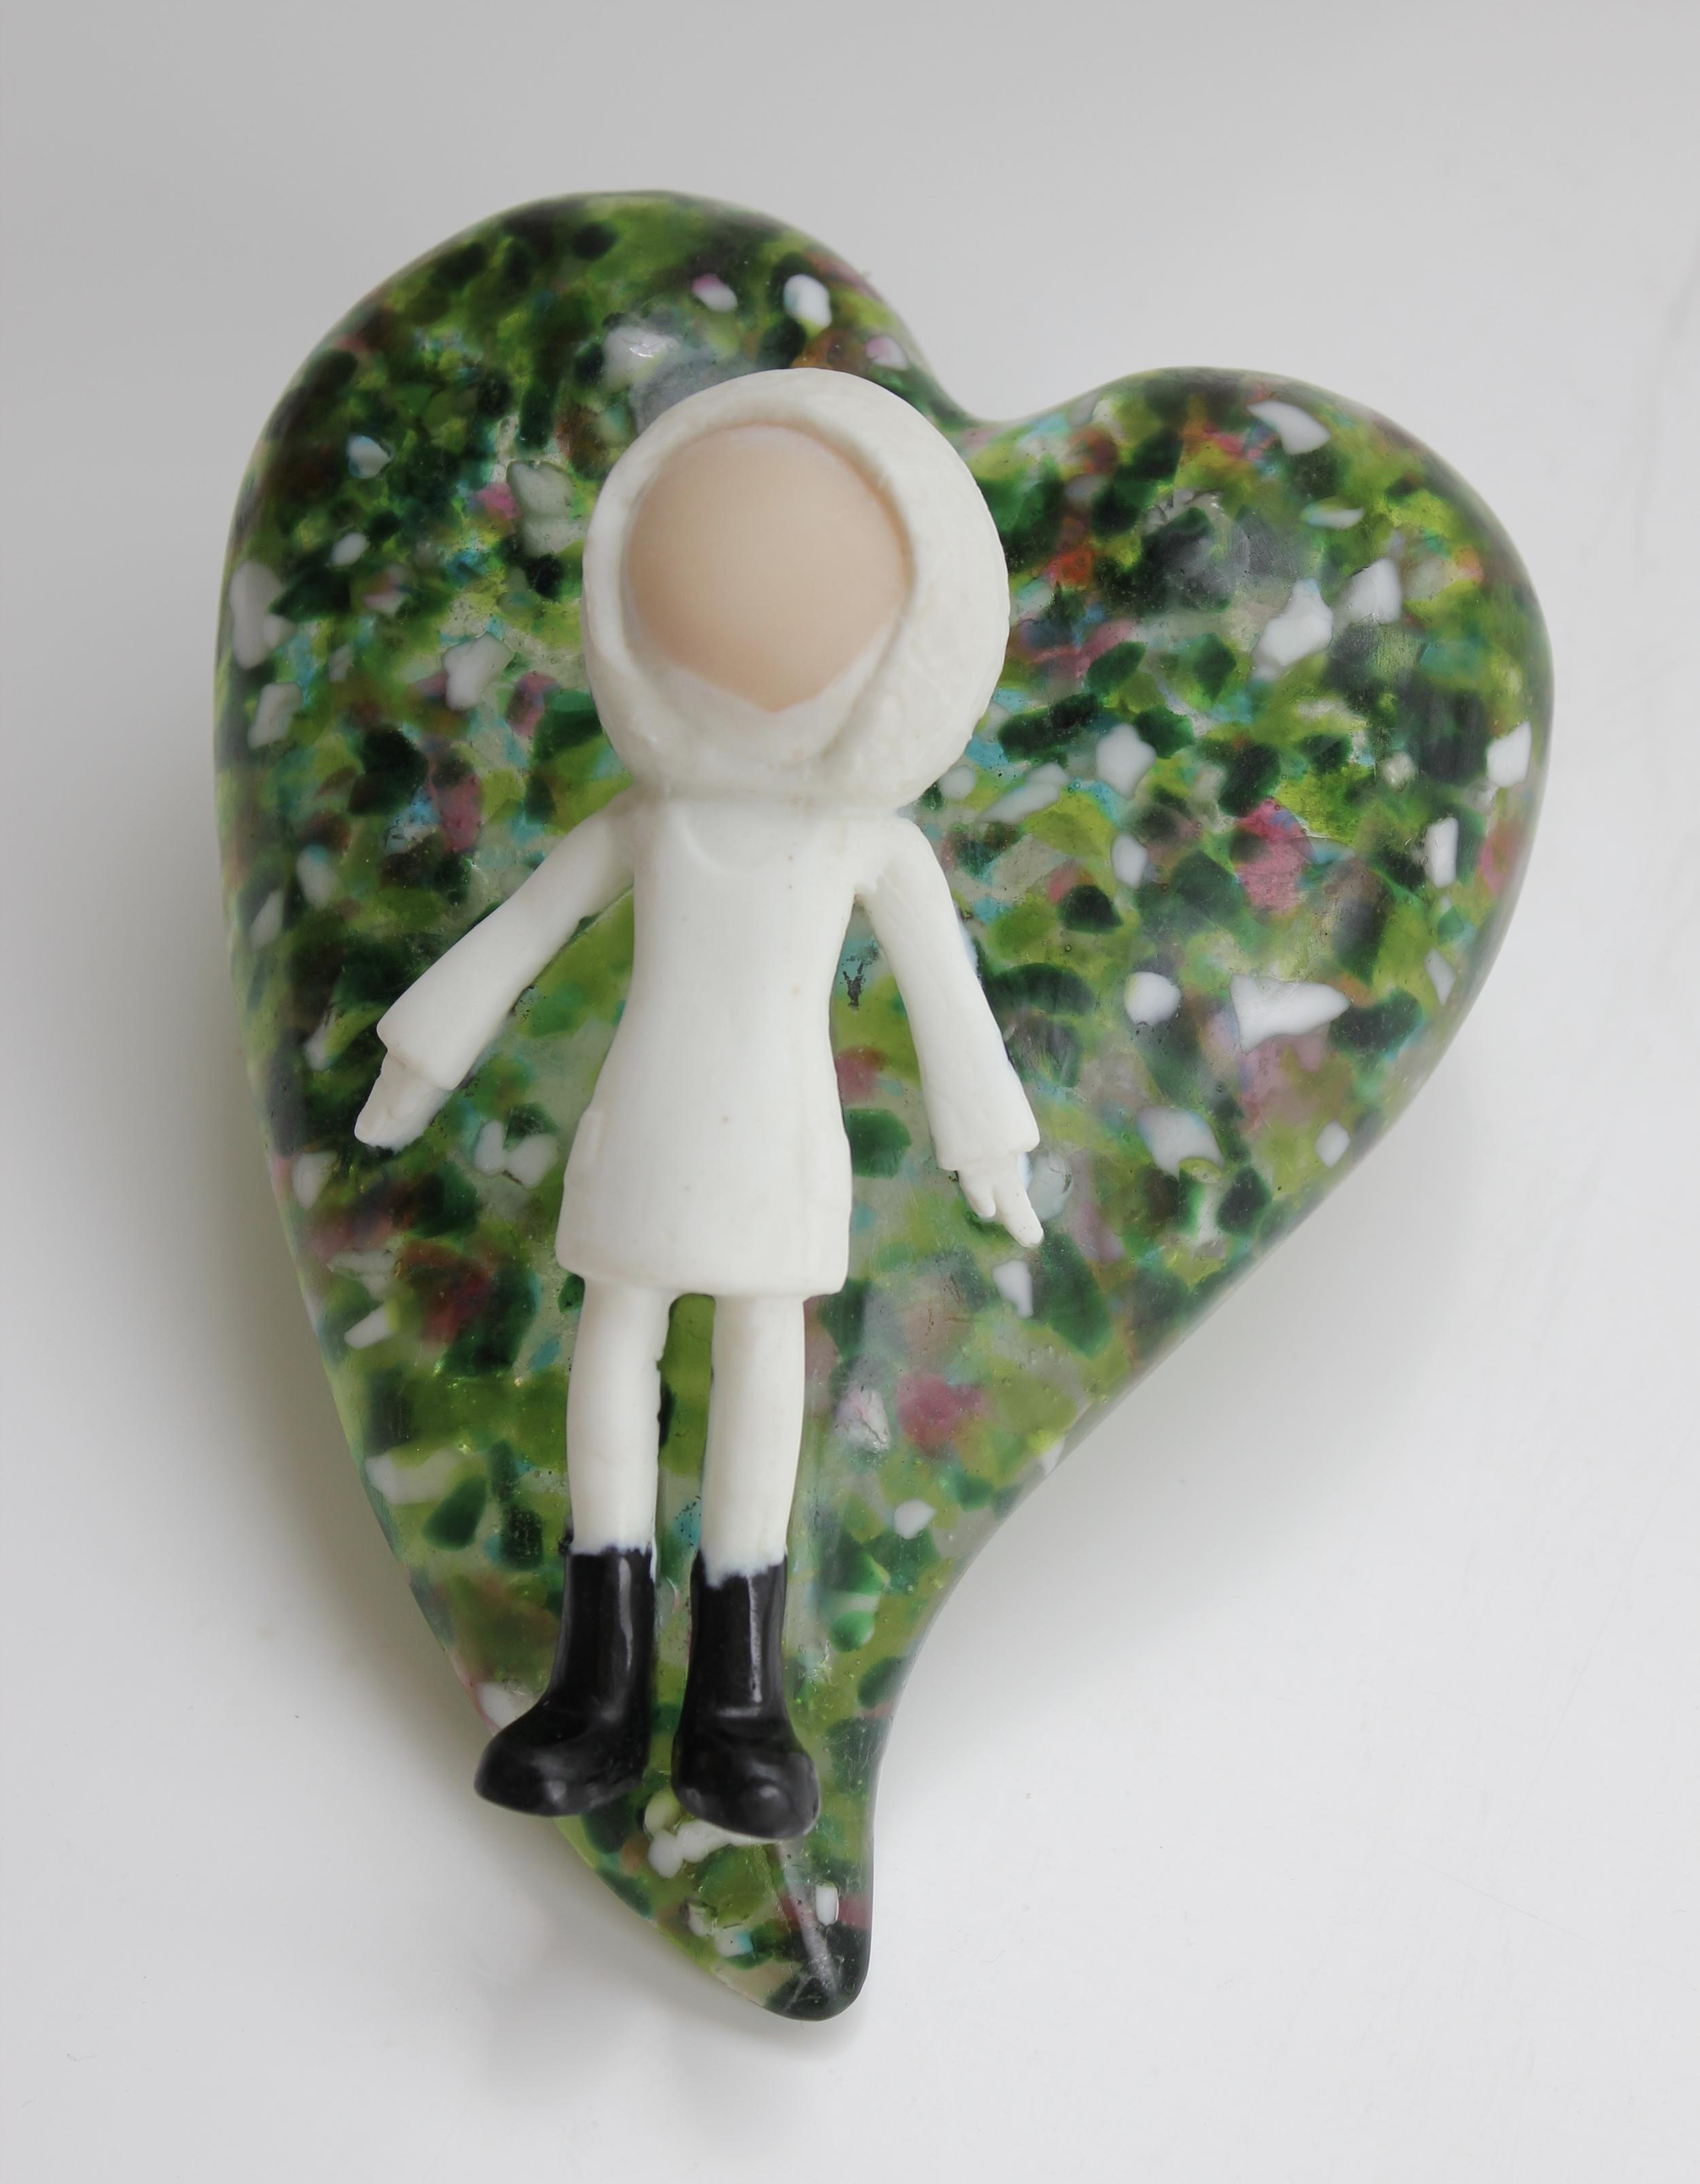 'Daydreamer' - Pate De Verre - Kiln Cast Glass